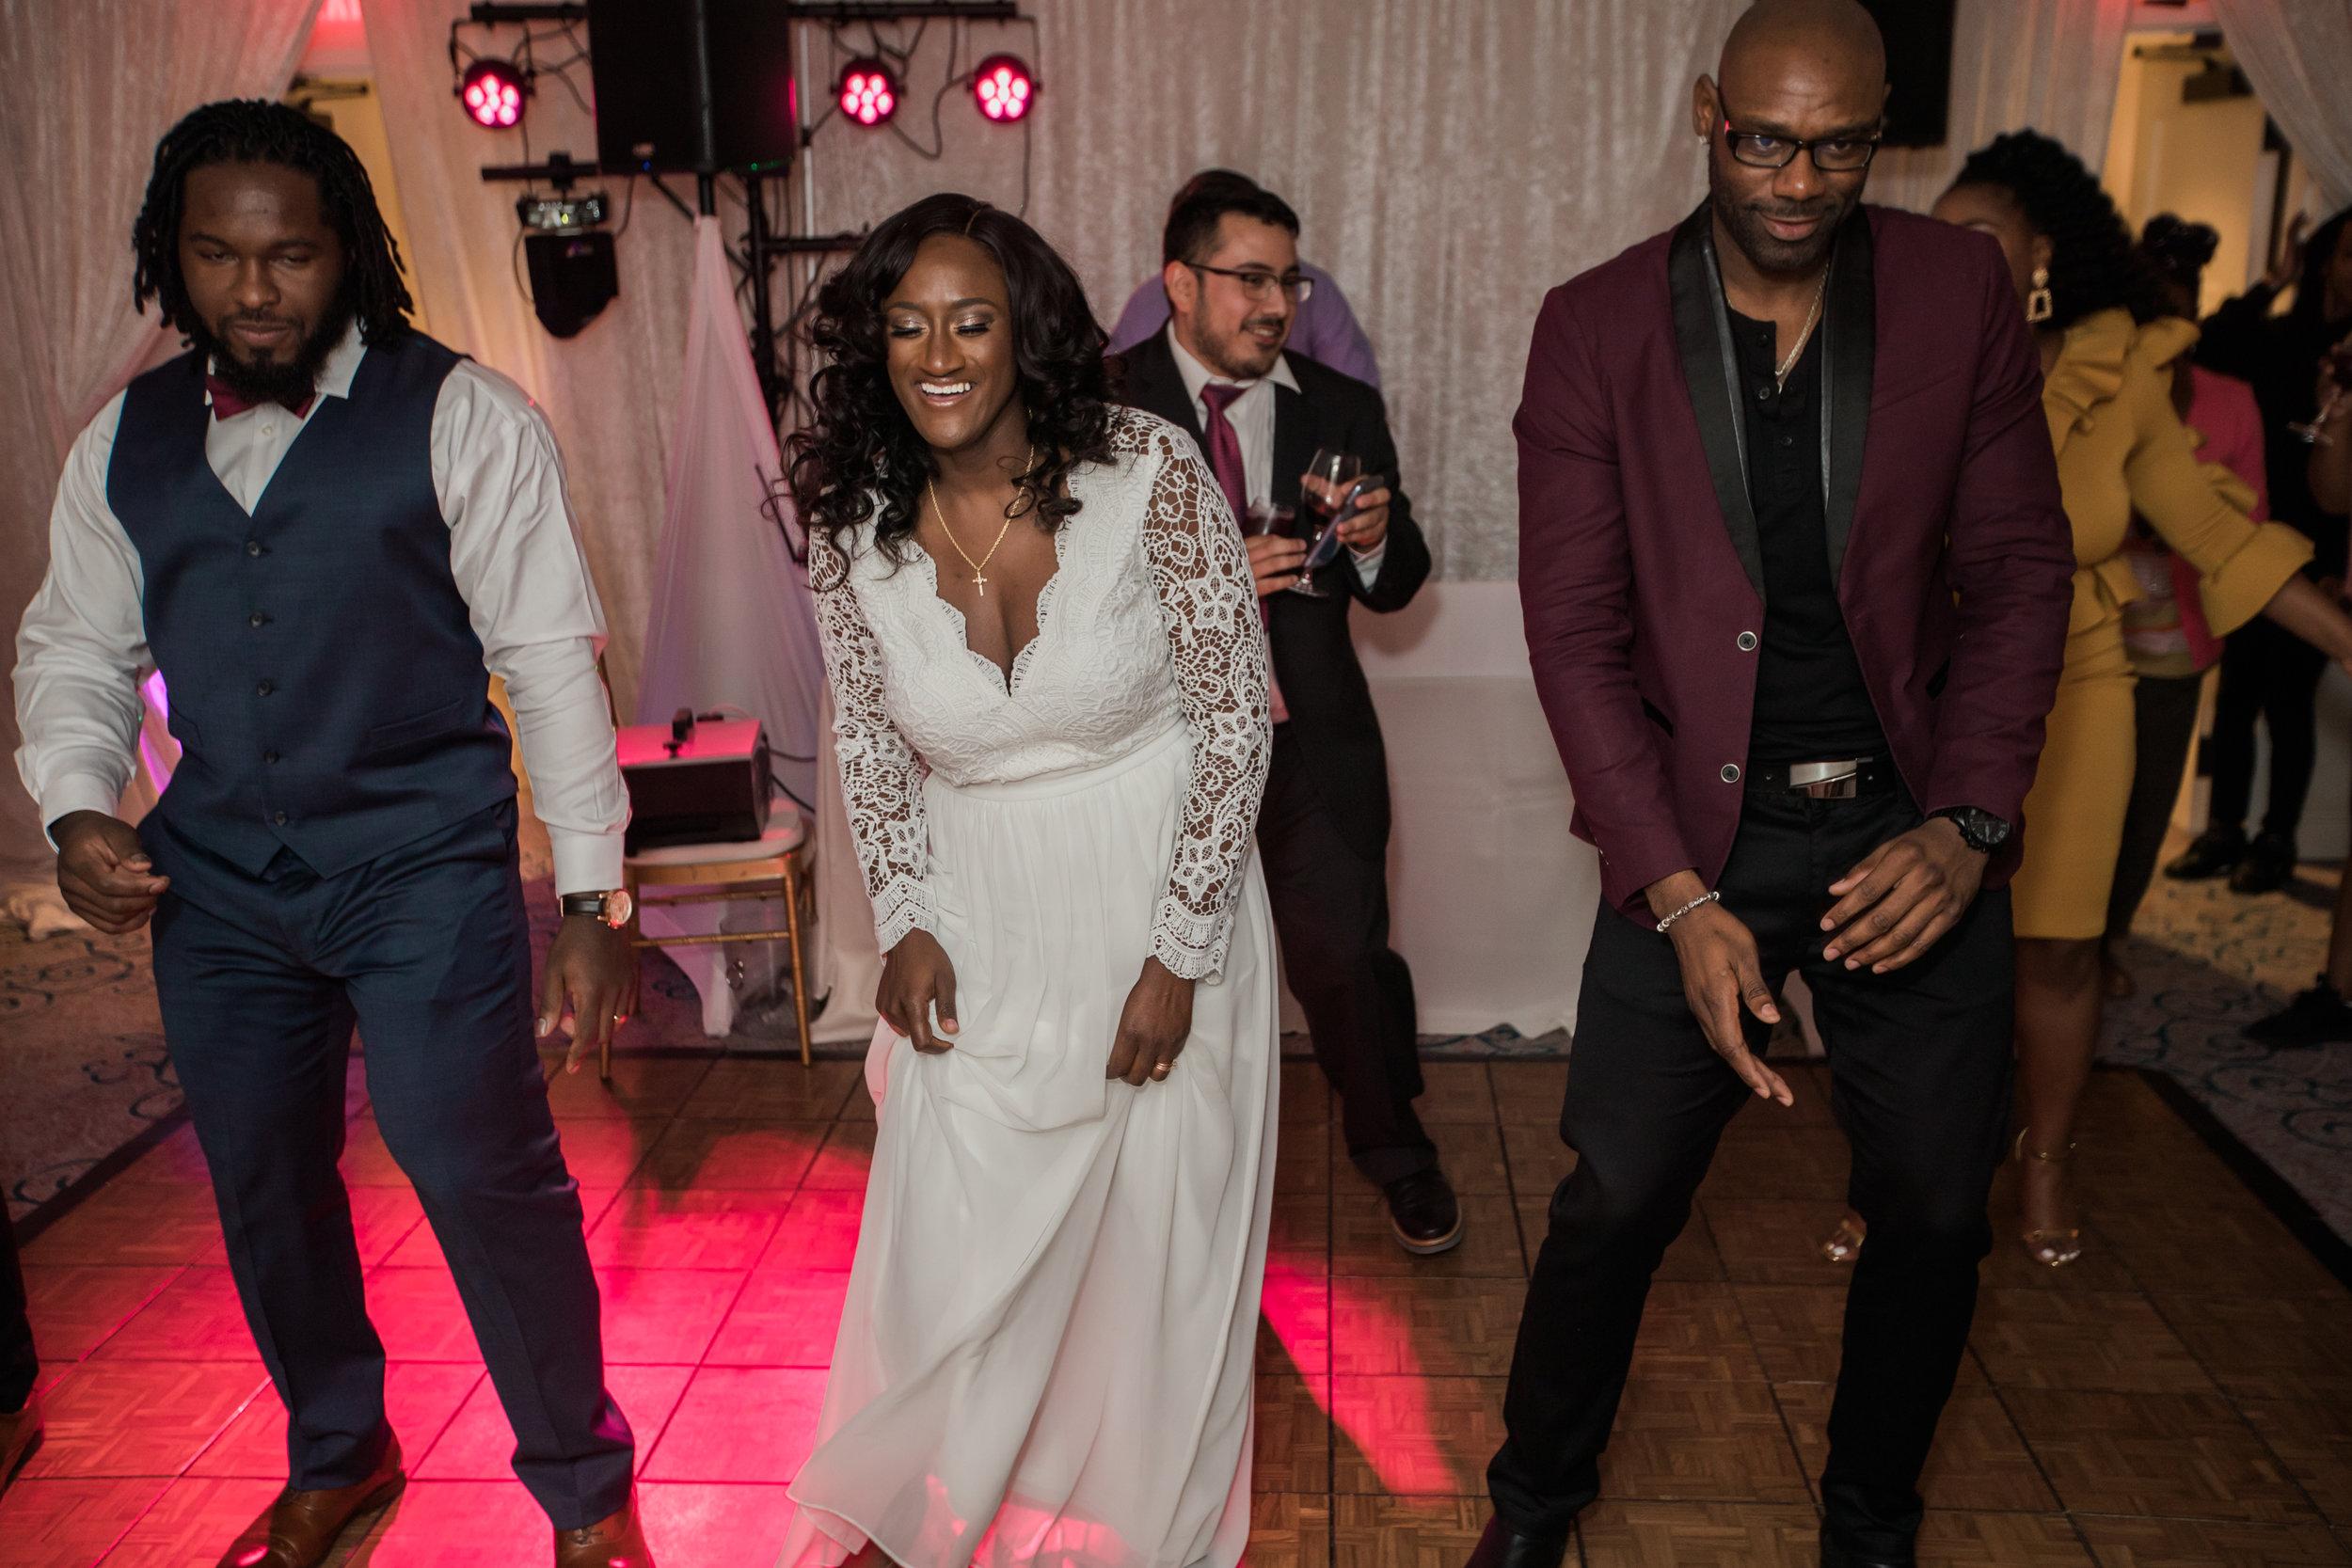 Baltimore City Wedding at Hotel Indigo Megapixels Media Photography Tira Lynn Events Black Bride and Groom (58 of 74).jpg